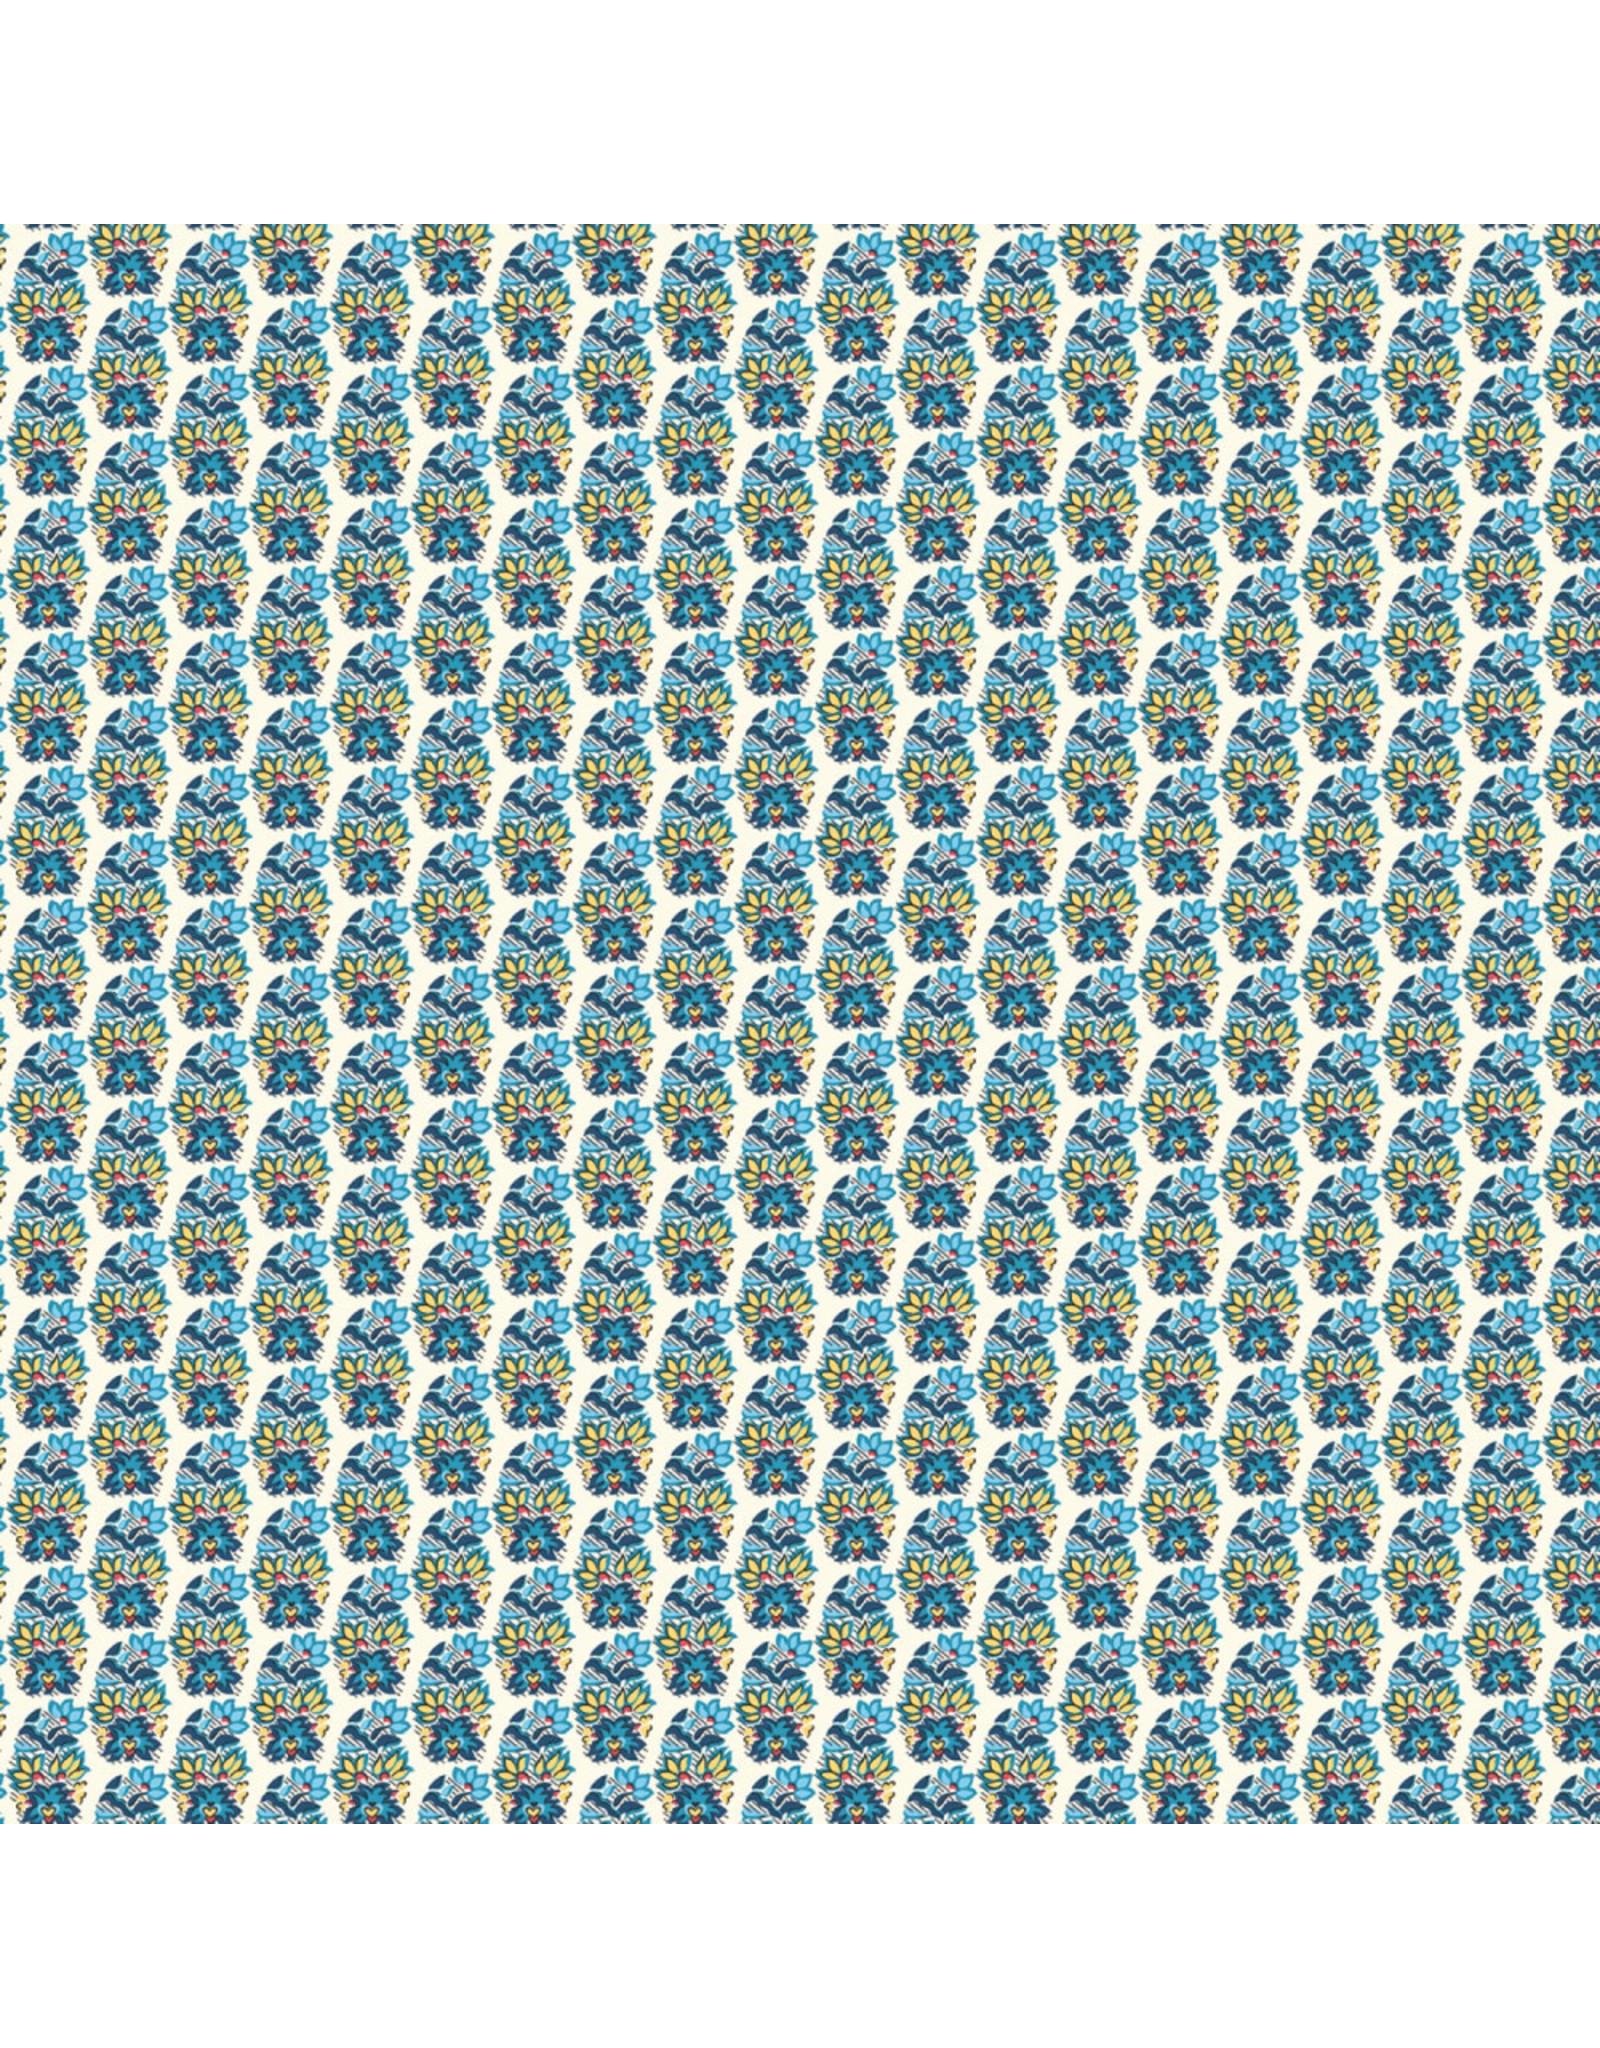 Liberty Fabrics Liberty Emporium,  Palmeria B, Fabric Half-Yards